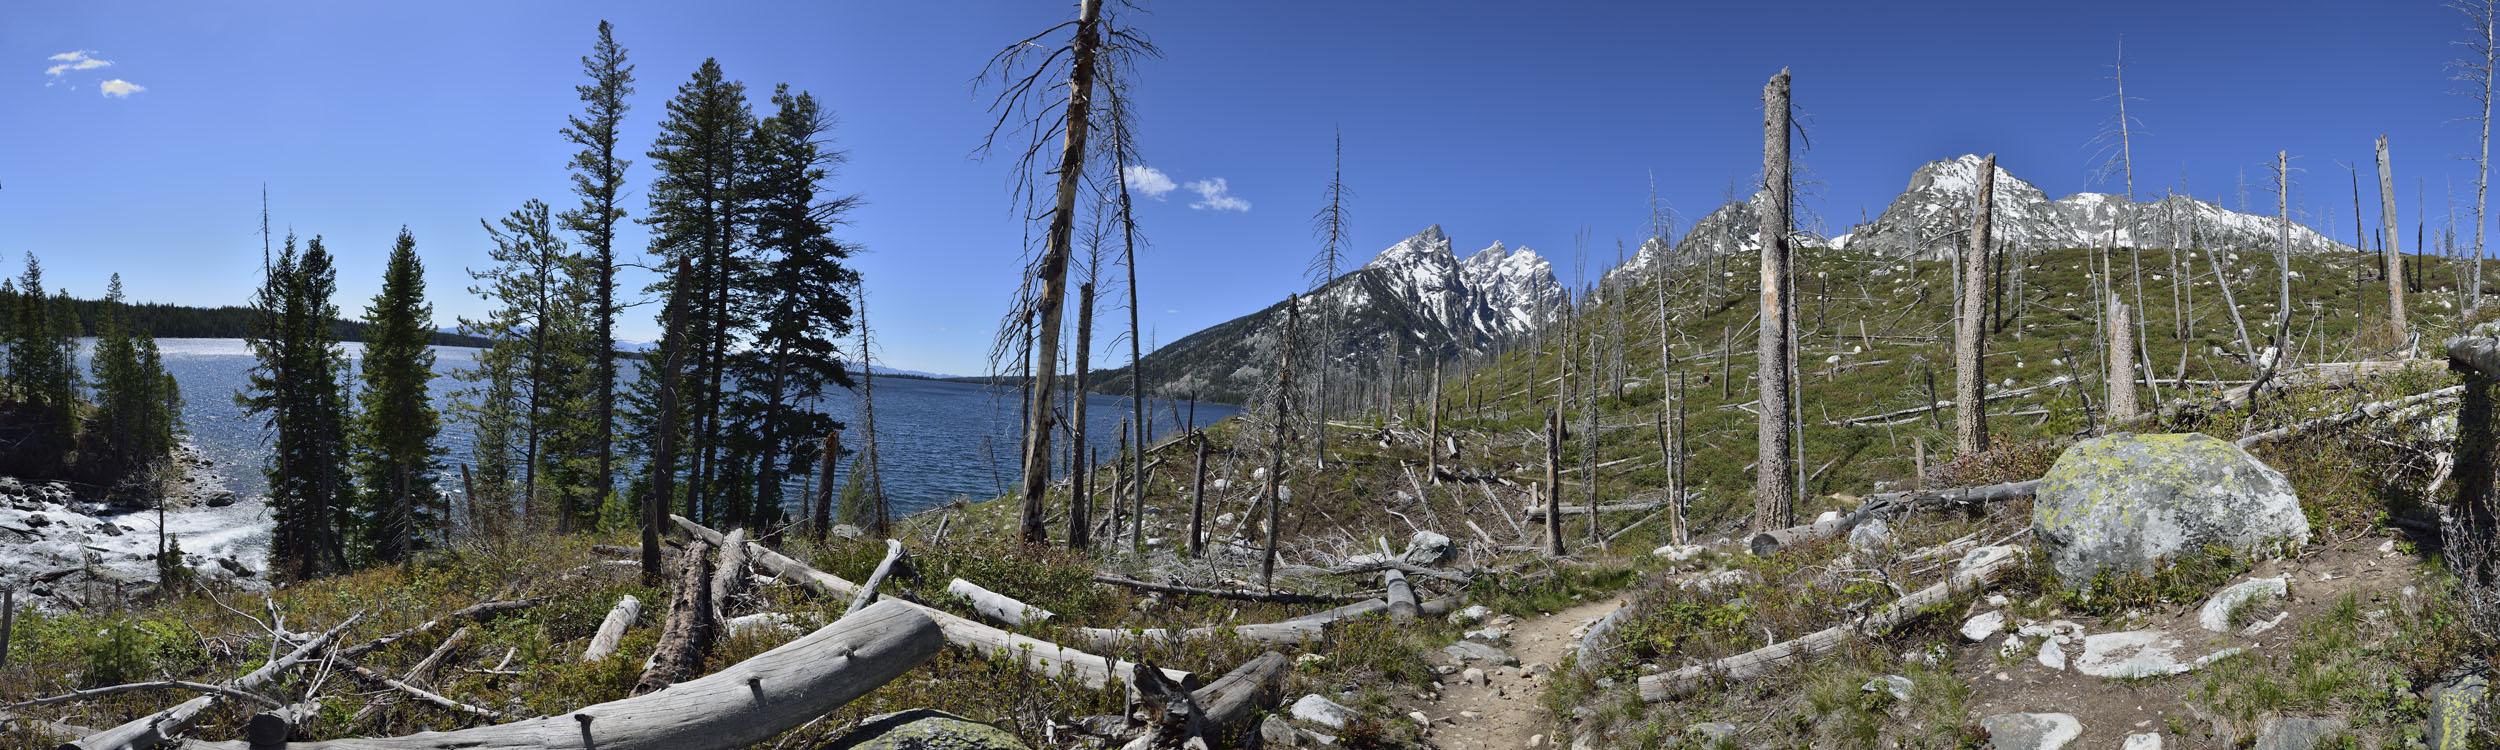 Jenny Lake and Grand Tetons